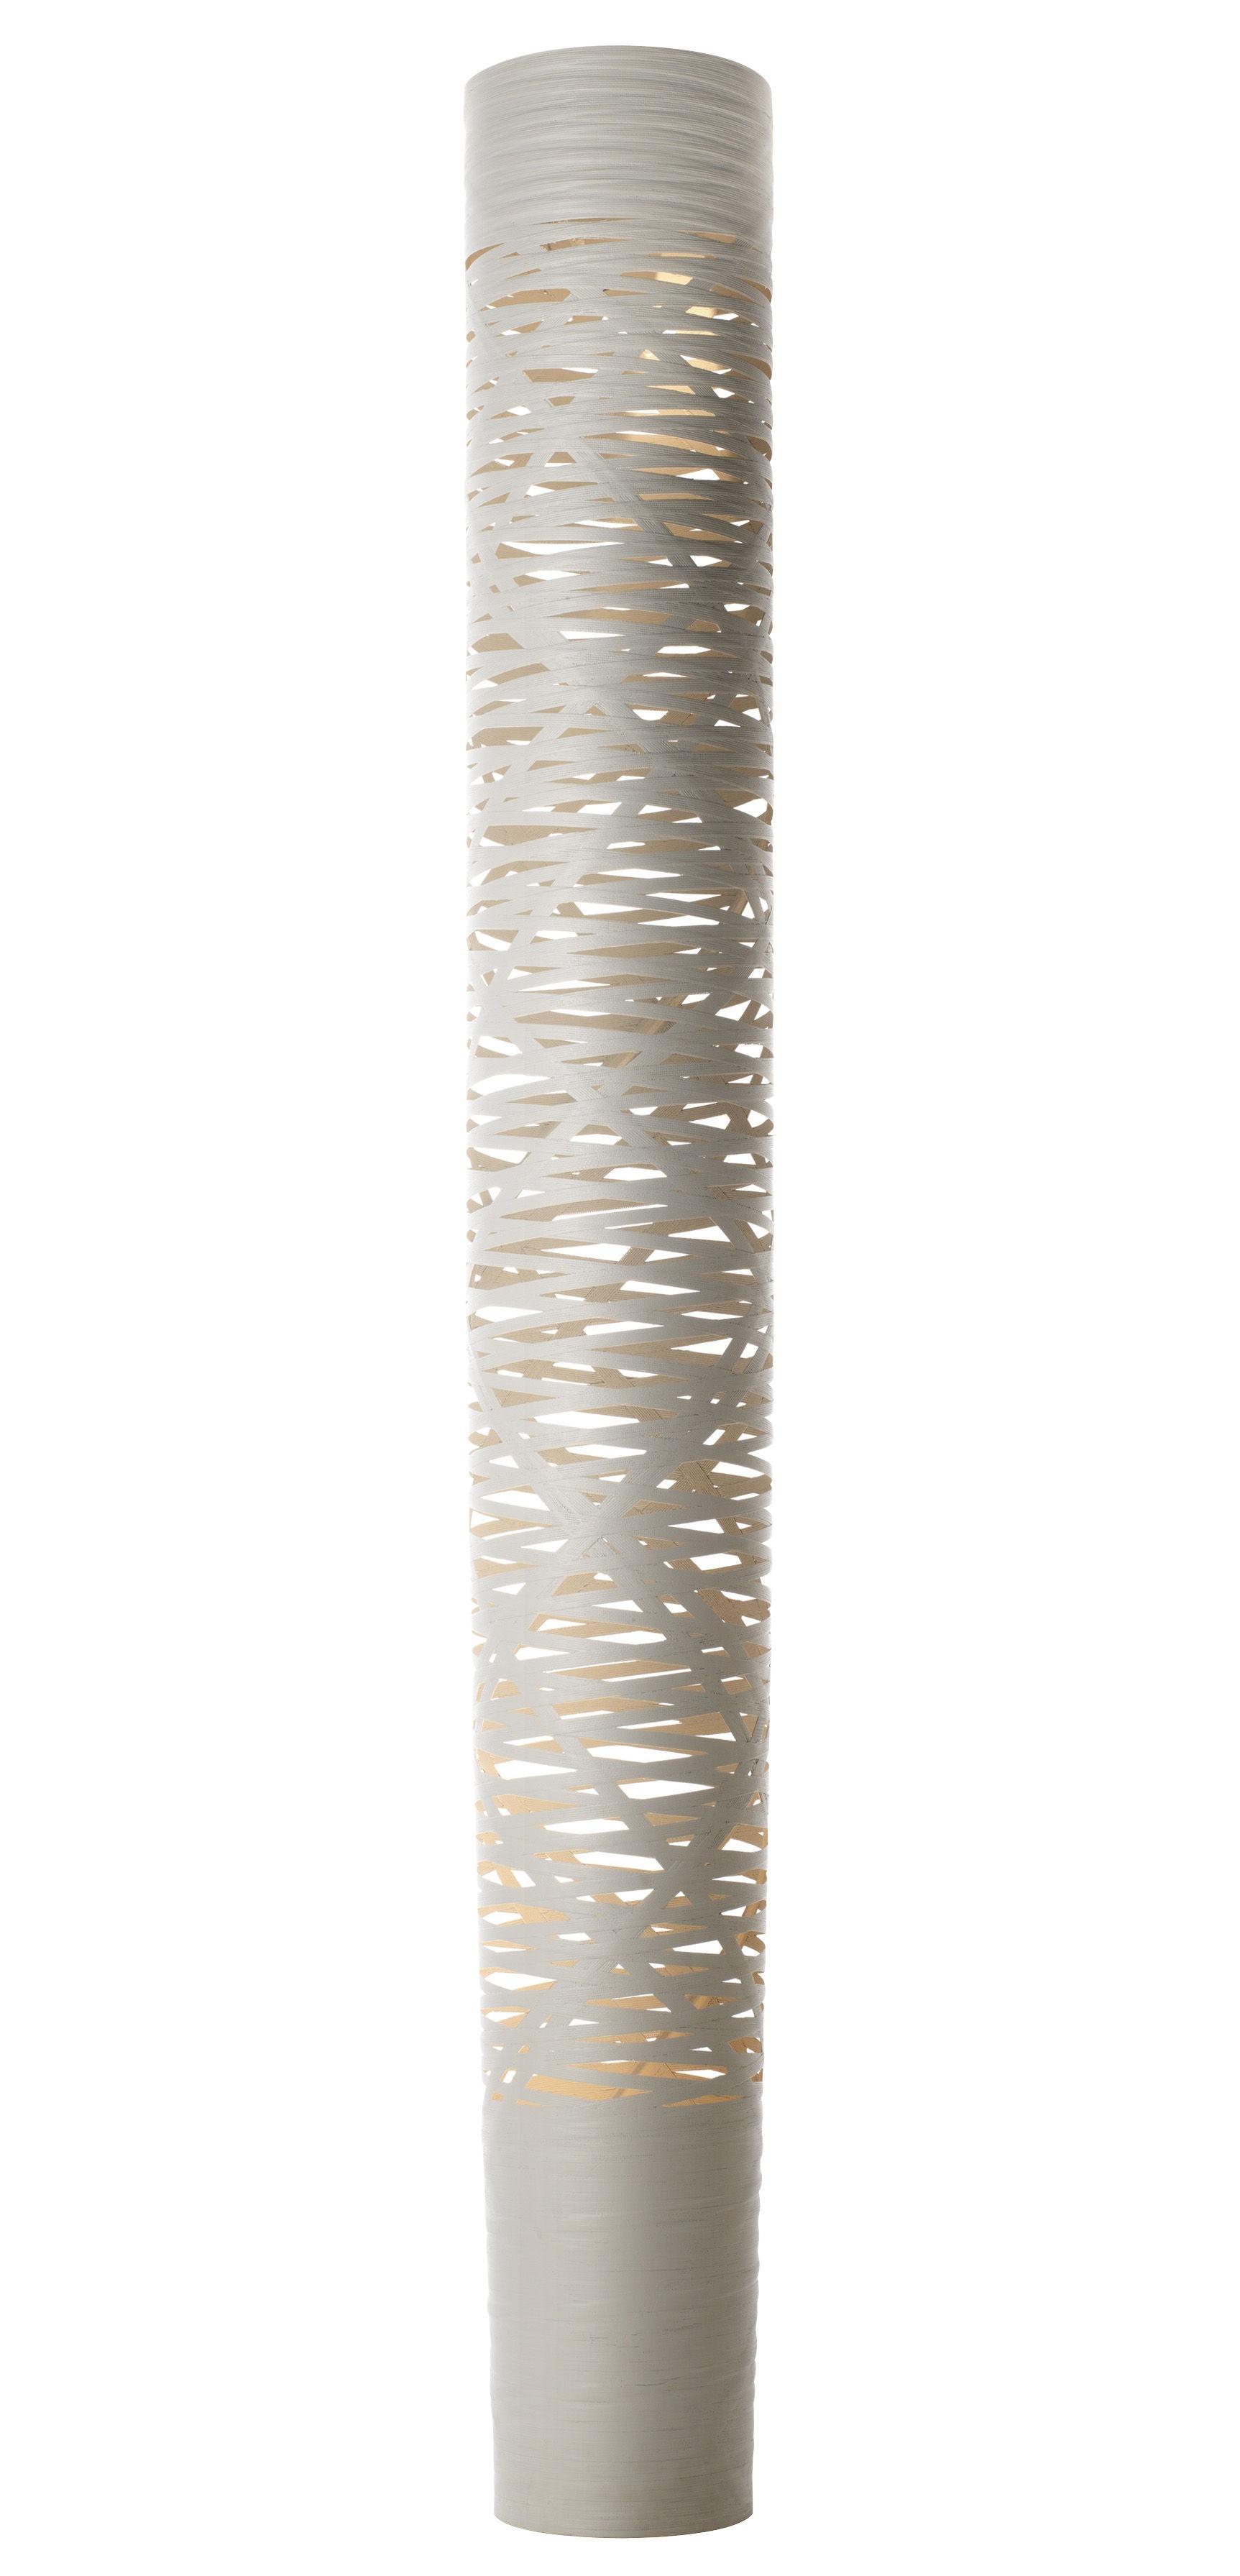 Lighting - Floor lamps - Tress Floor lamp - H 195 cm by Foscarini - White - Composite material, Fibreglass